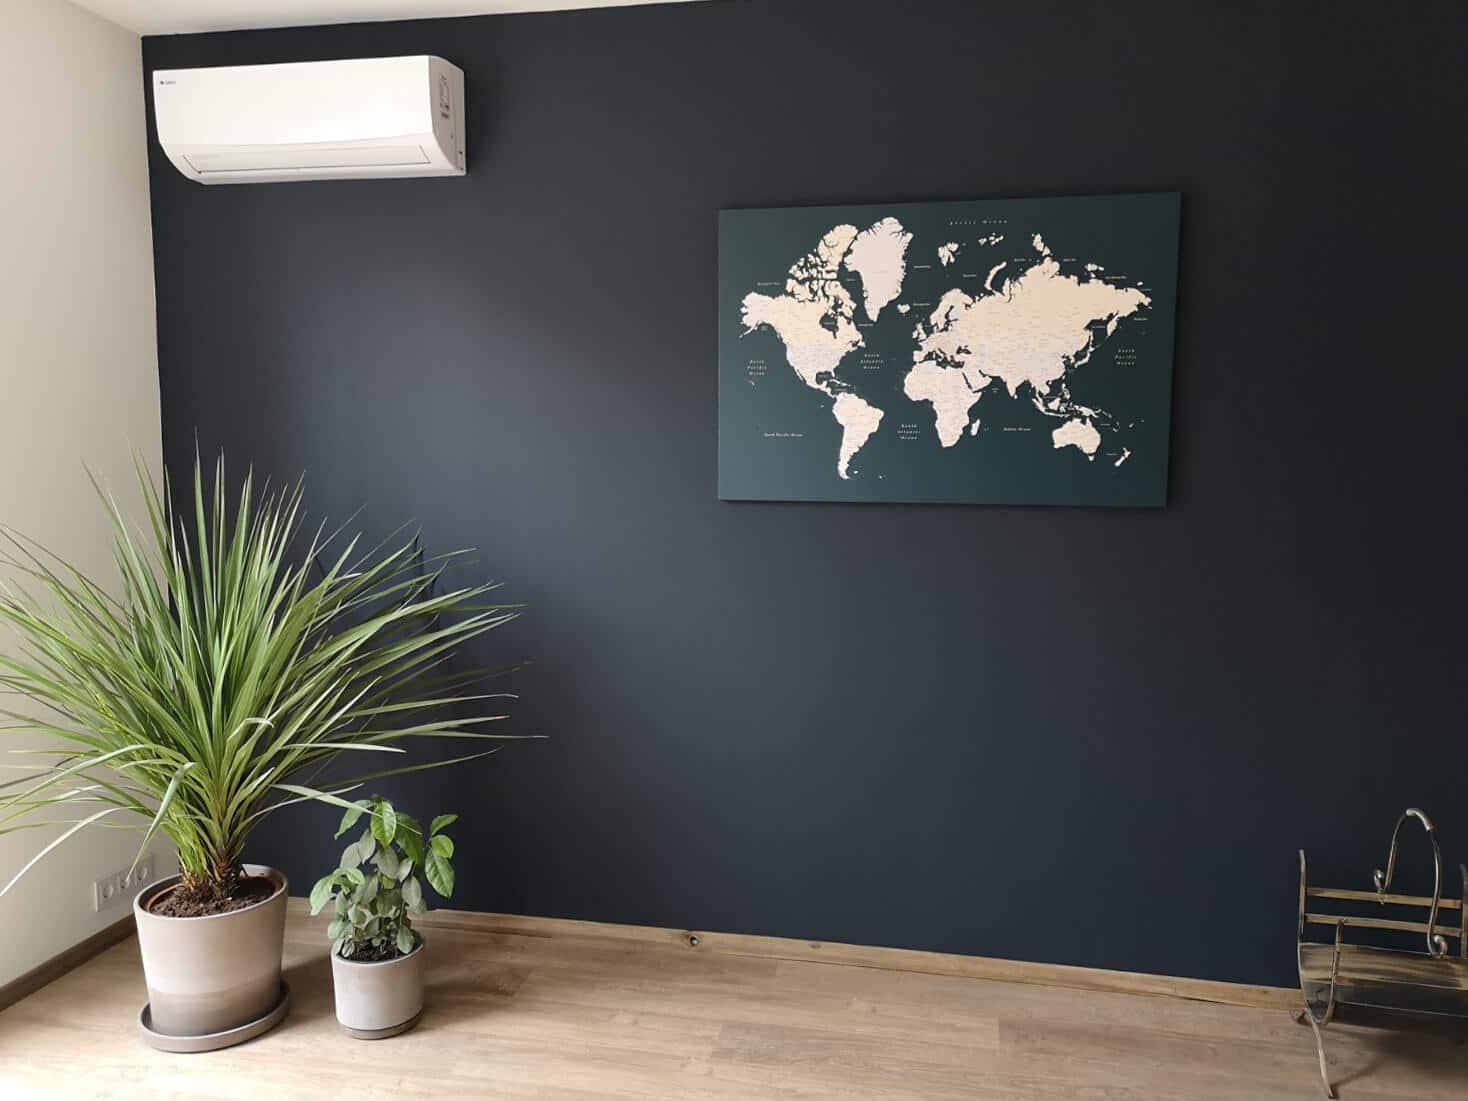 green wall art decor in living room